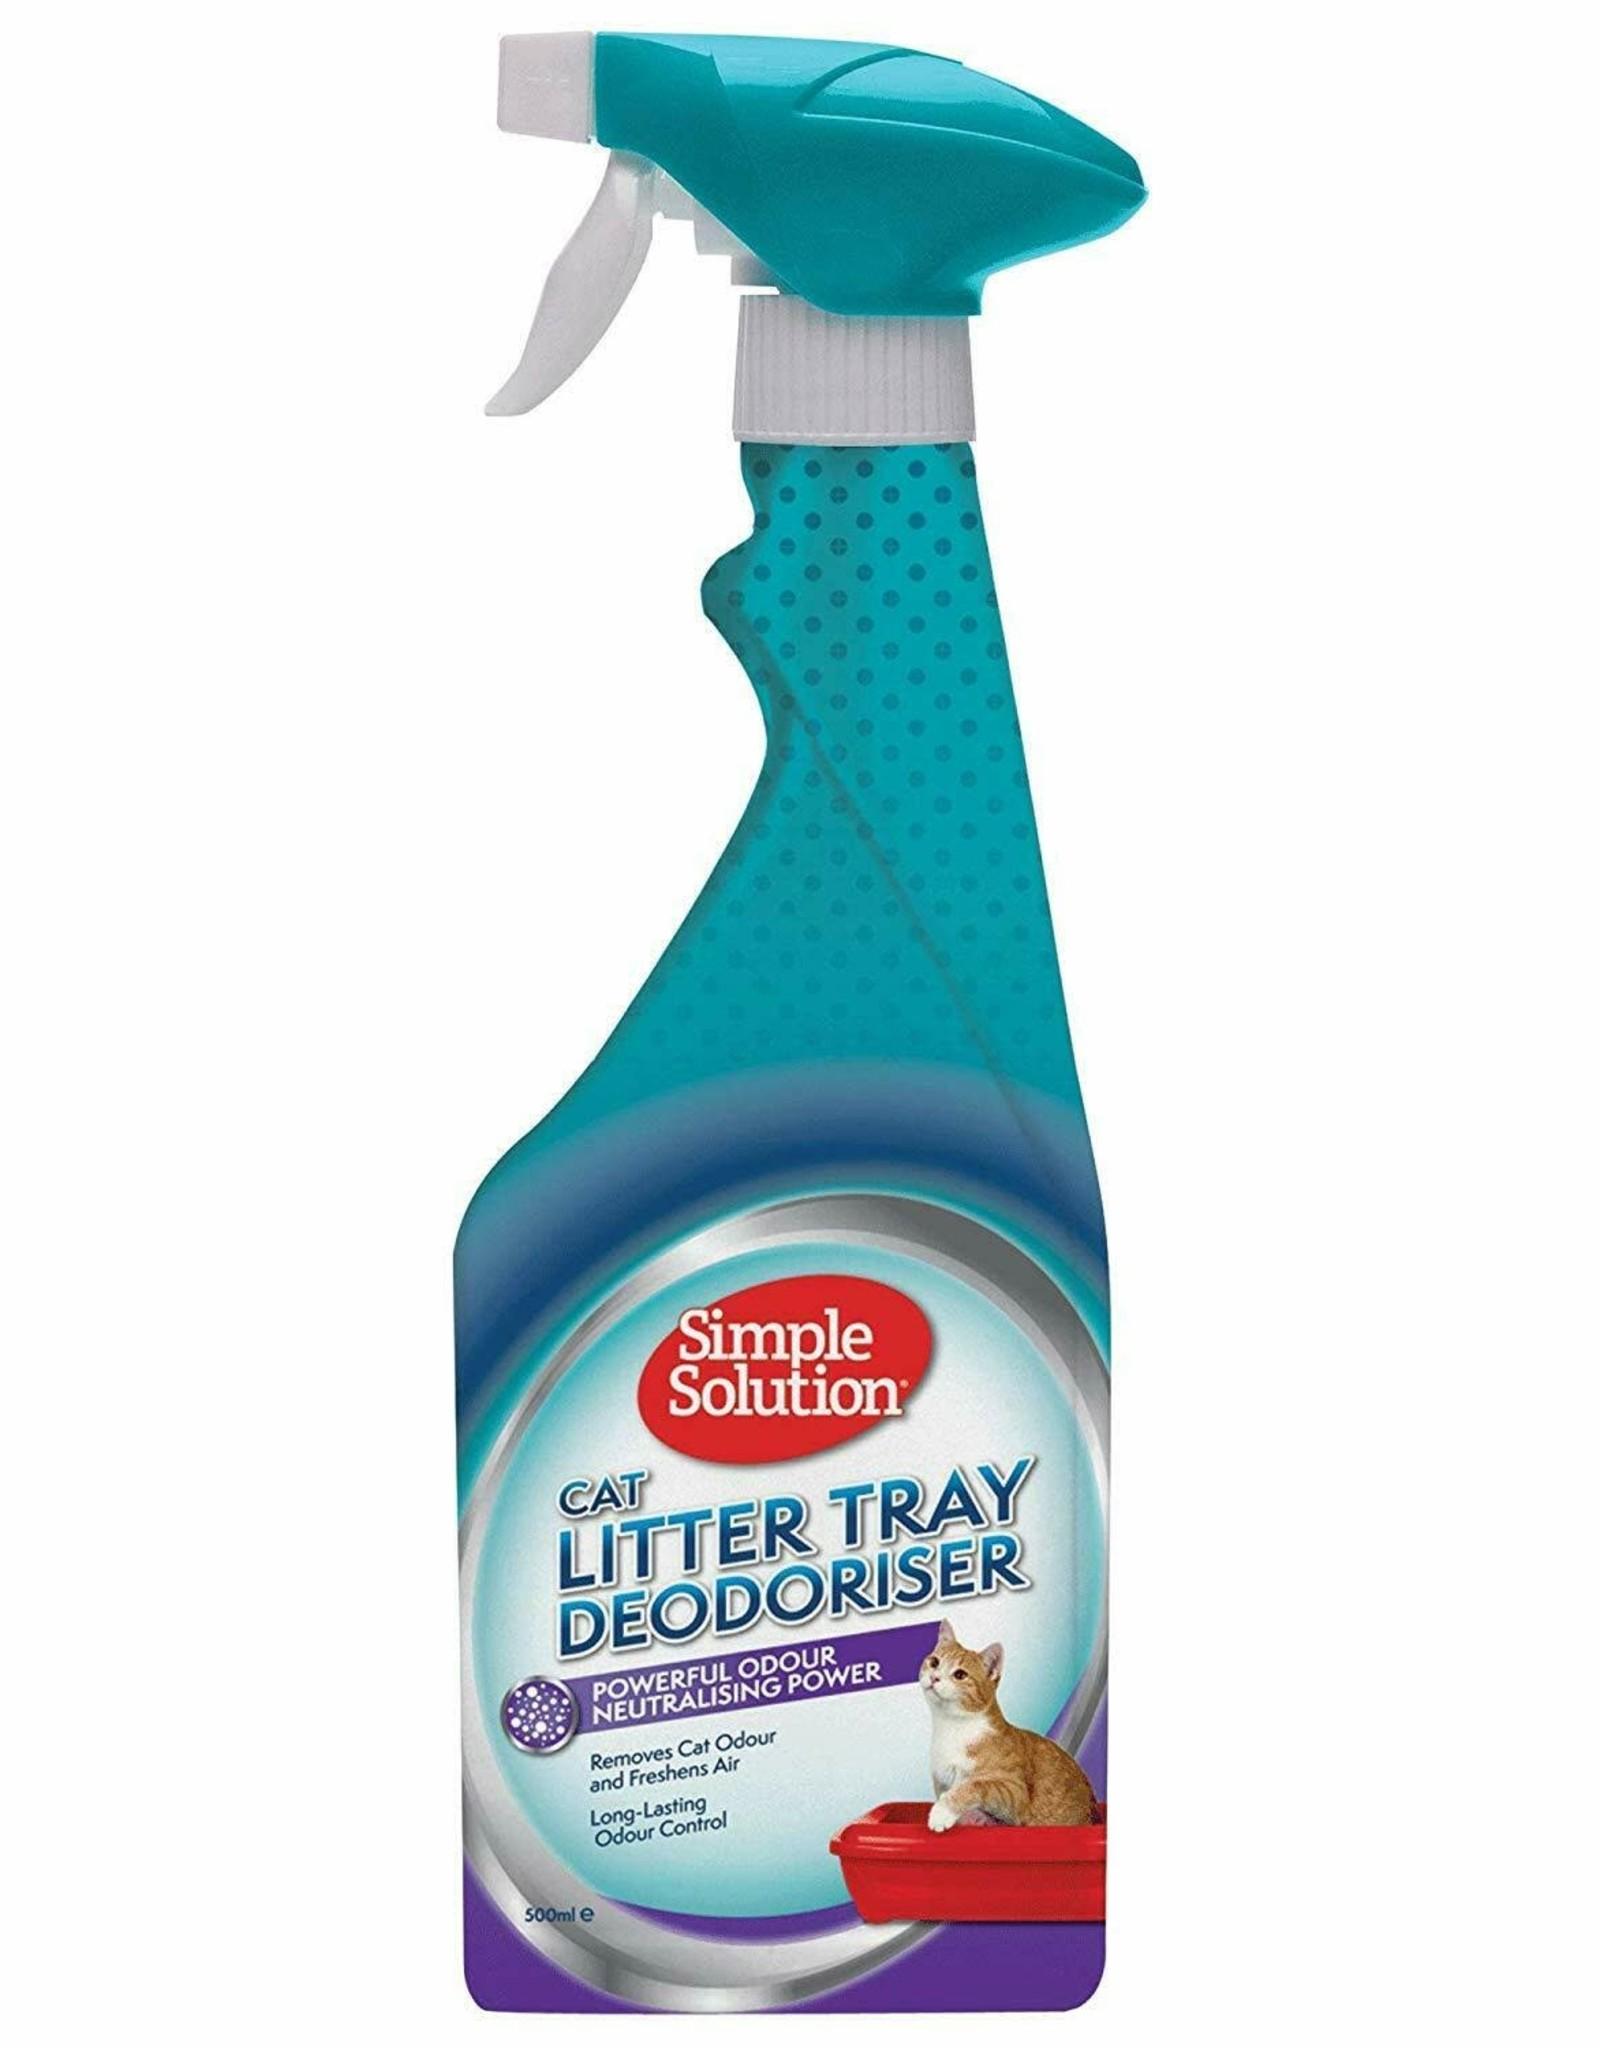 Simple Solution Cat Litter Tray Deodoriser, 500ml